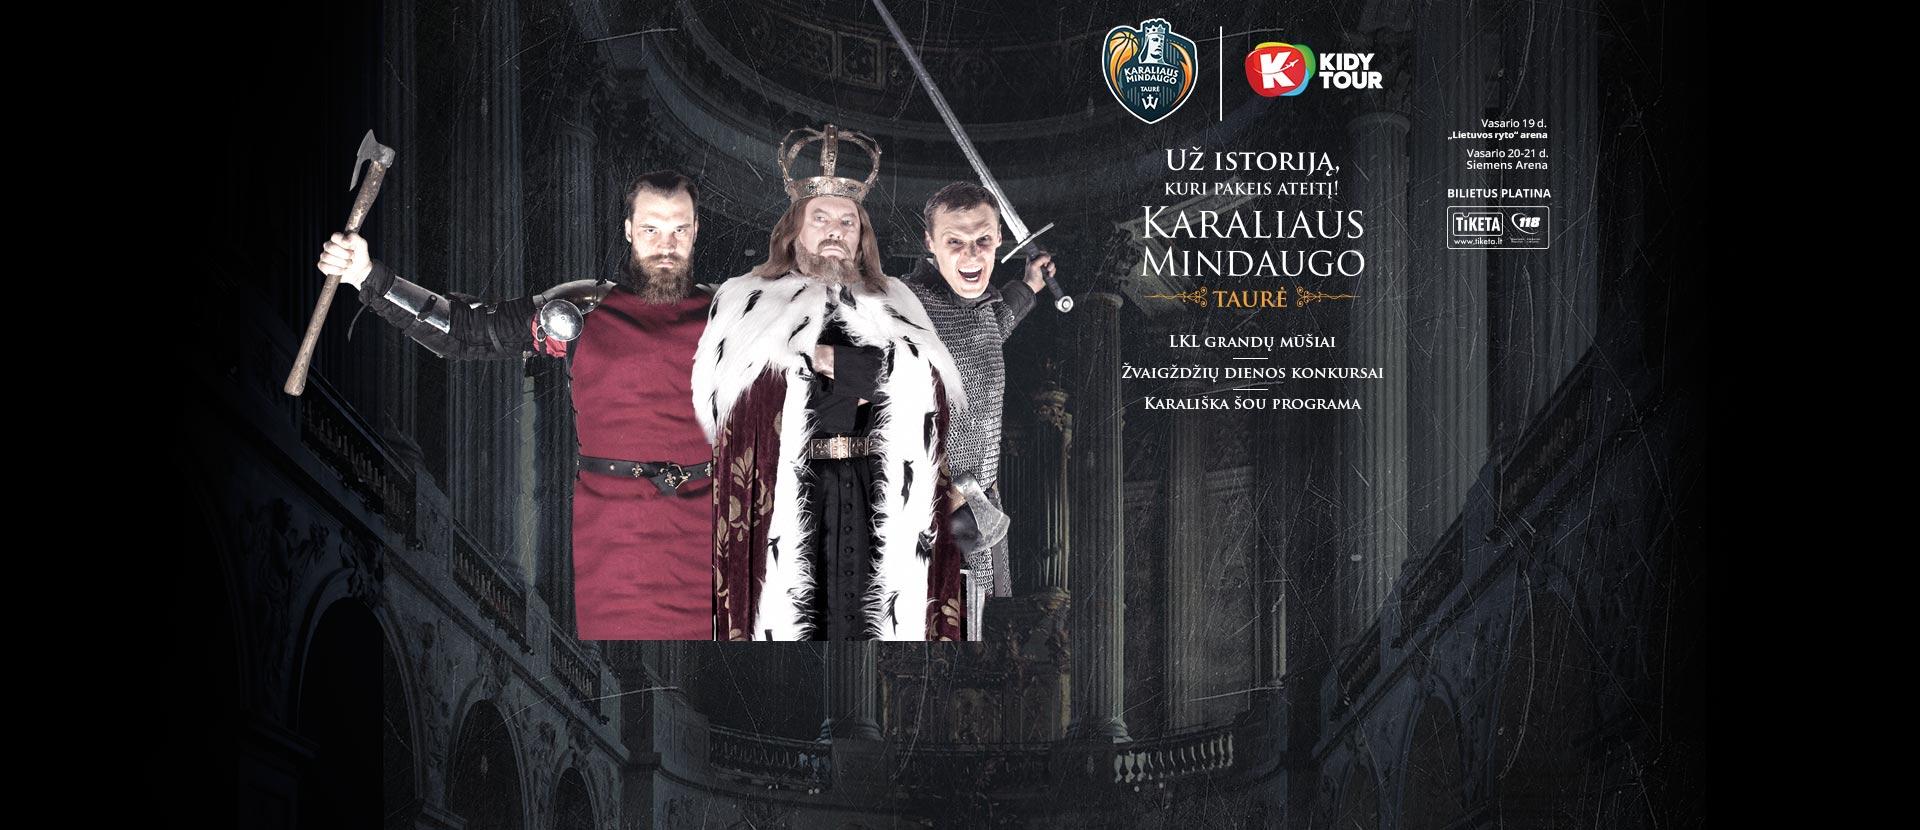 KIDY tour – Karaliaus Mindaugo taurė